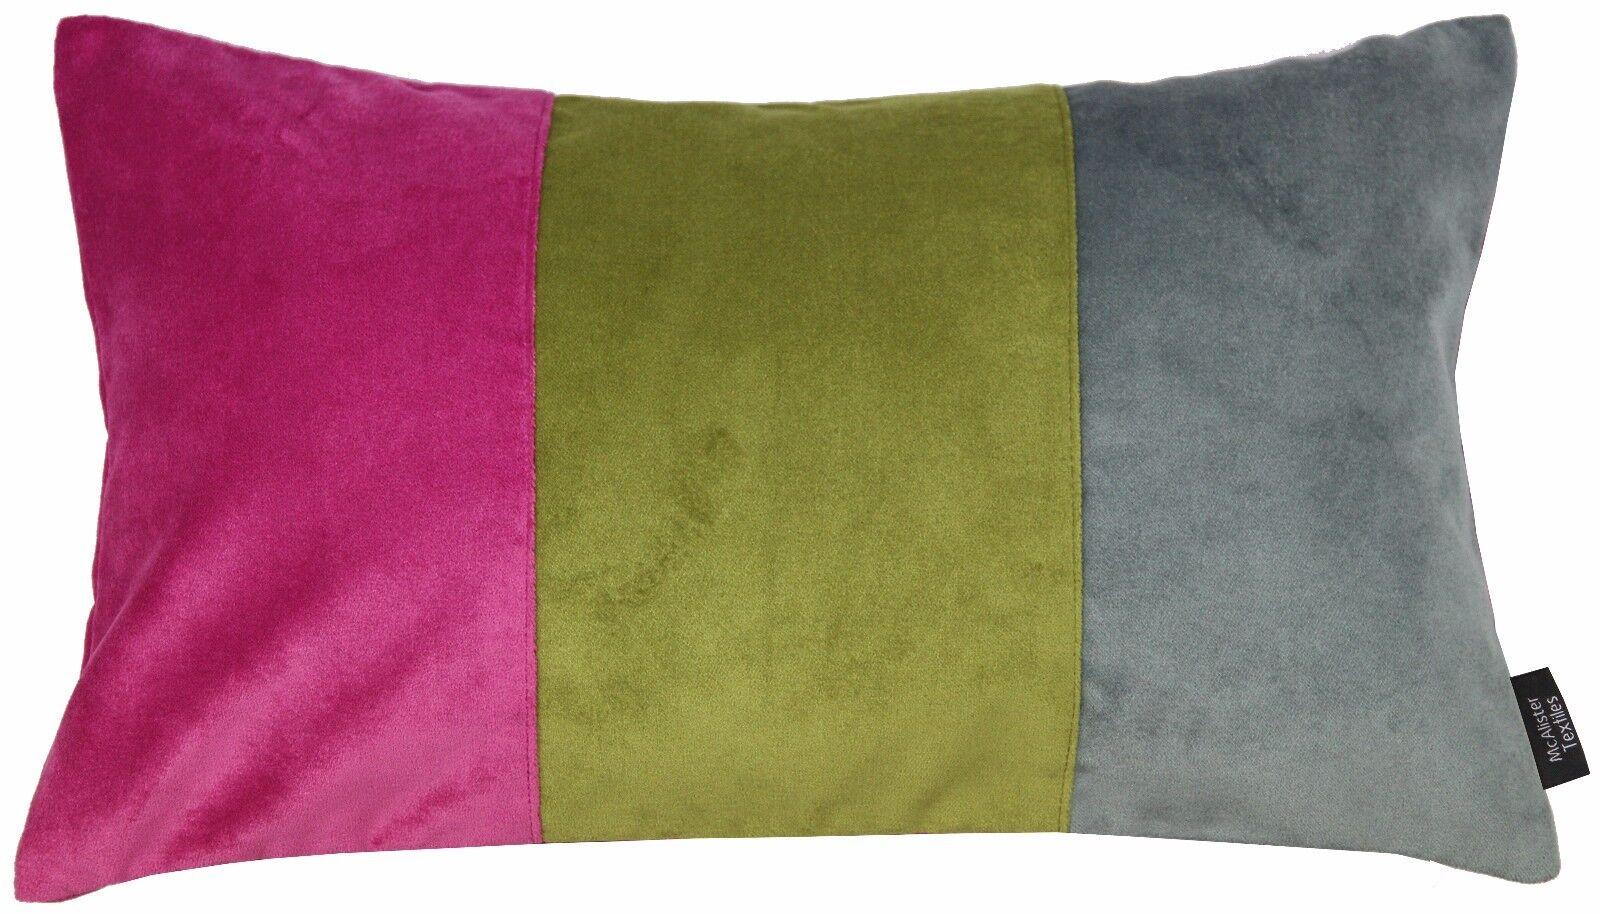 McAlister in tessile 3 ColoreeeE MATT in McAlister velluto rosa, verde & Grigio Boudoir Cuscino 0d3592